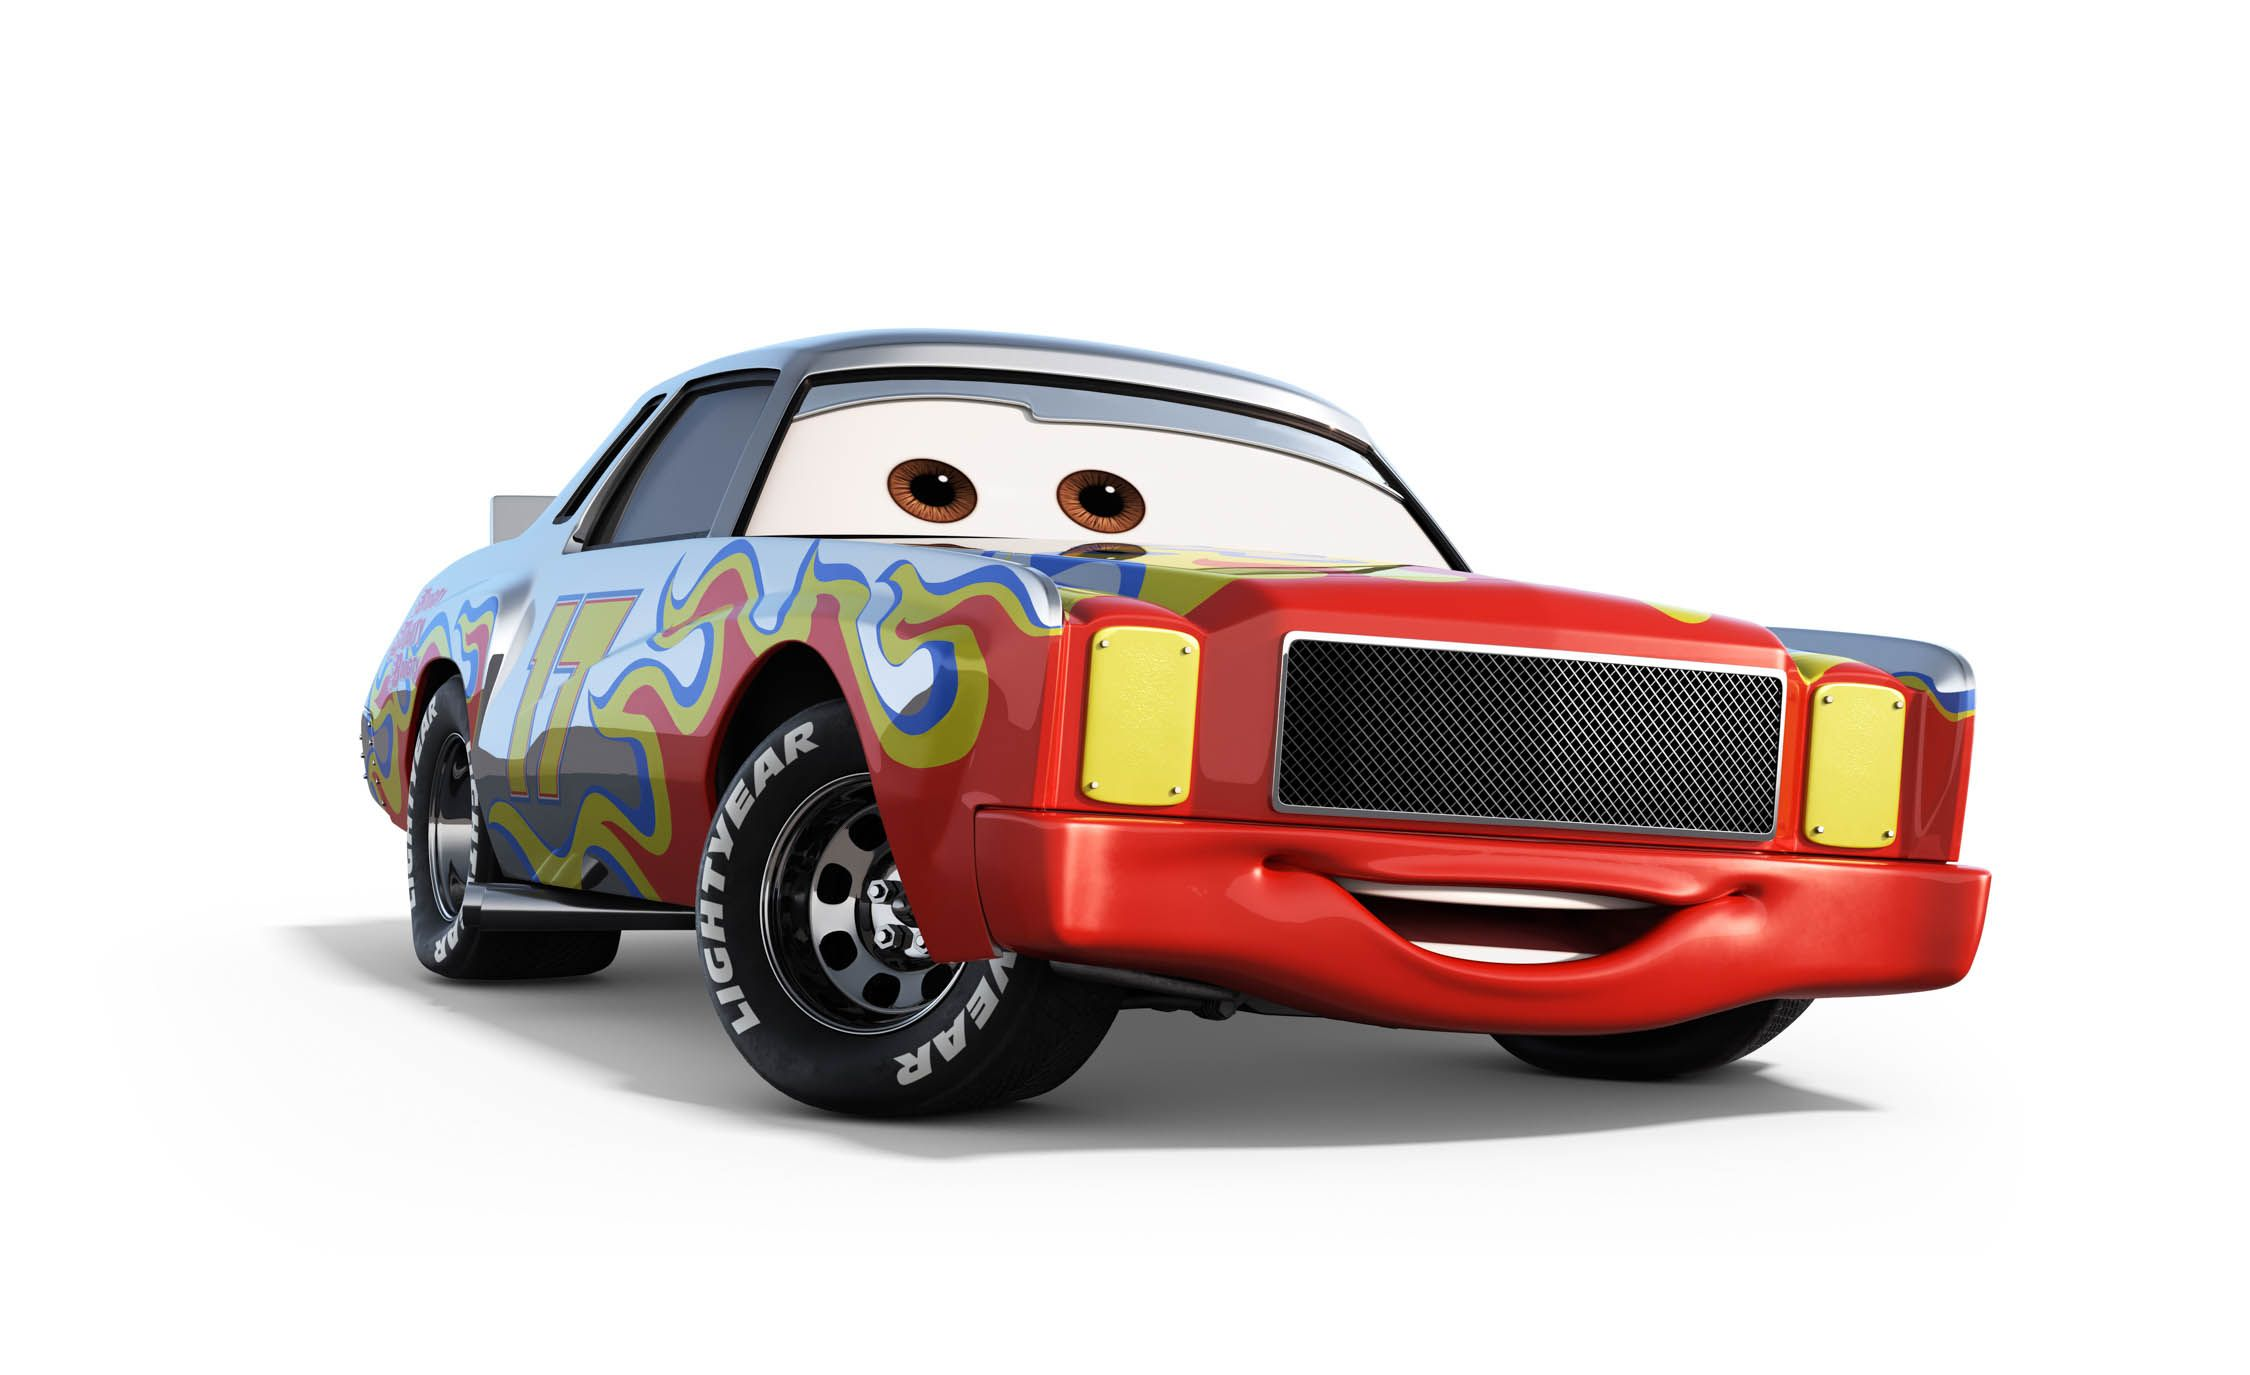 Lewis Hamilton Cars 2 Toys R Us